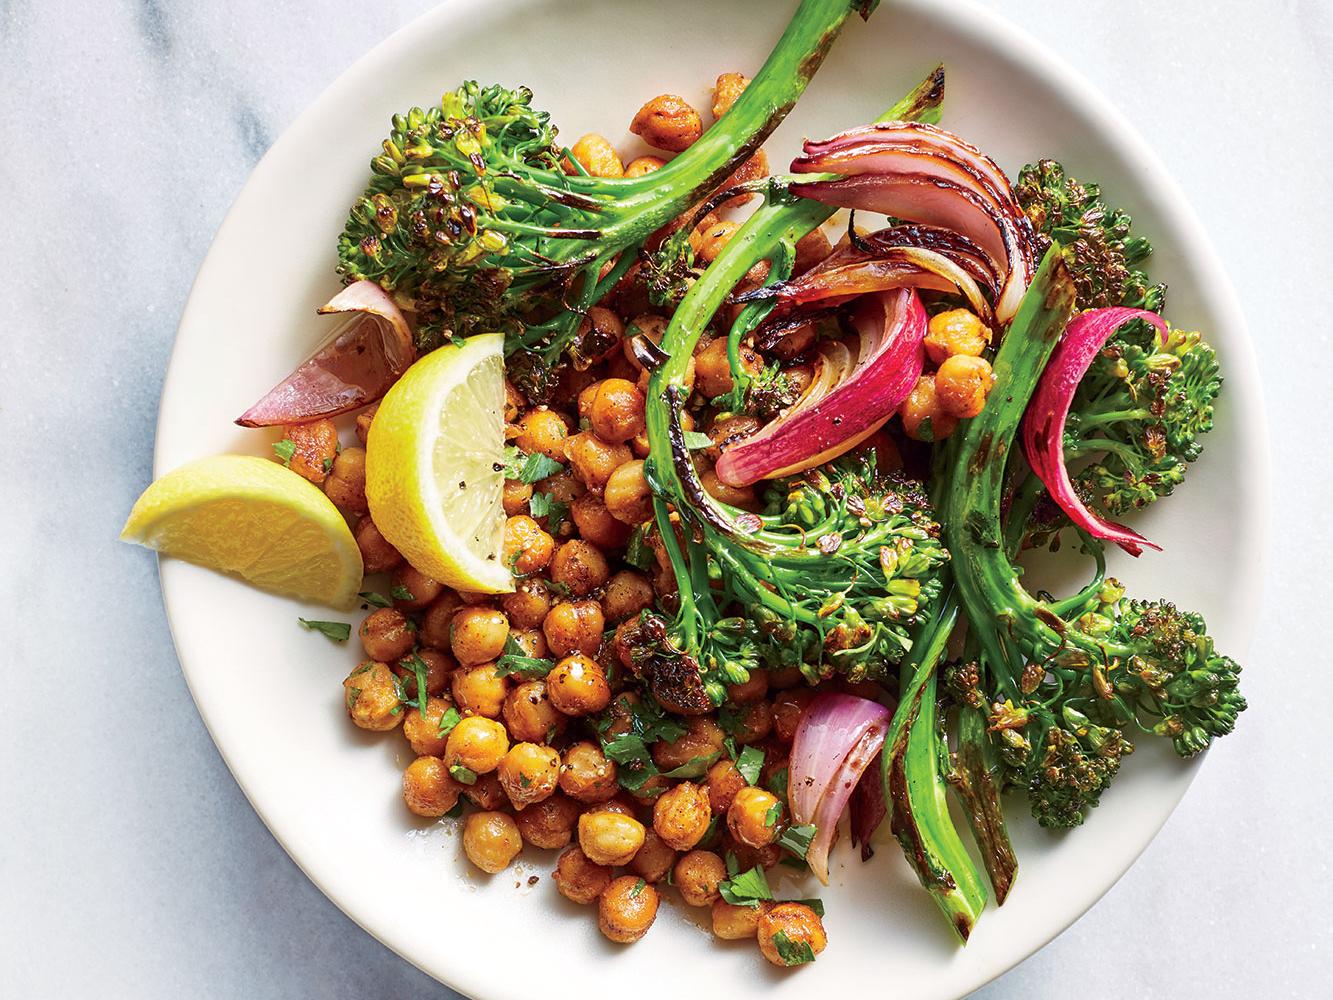 Charred Broccolini and Onion Chickpea Bowls